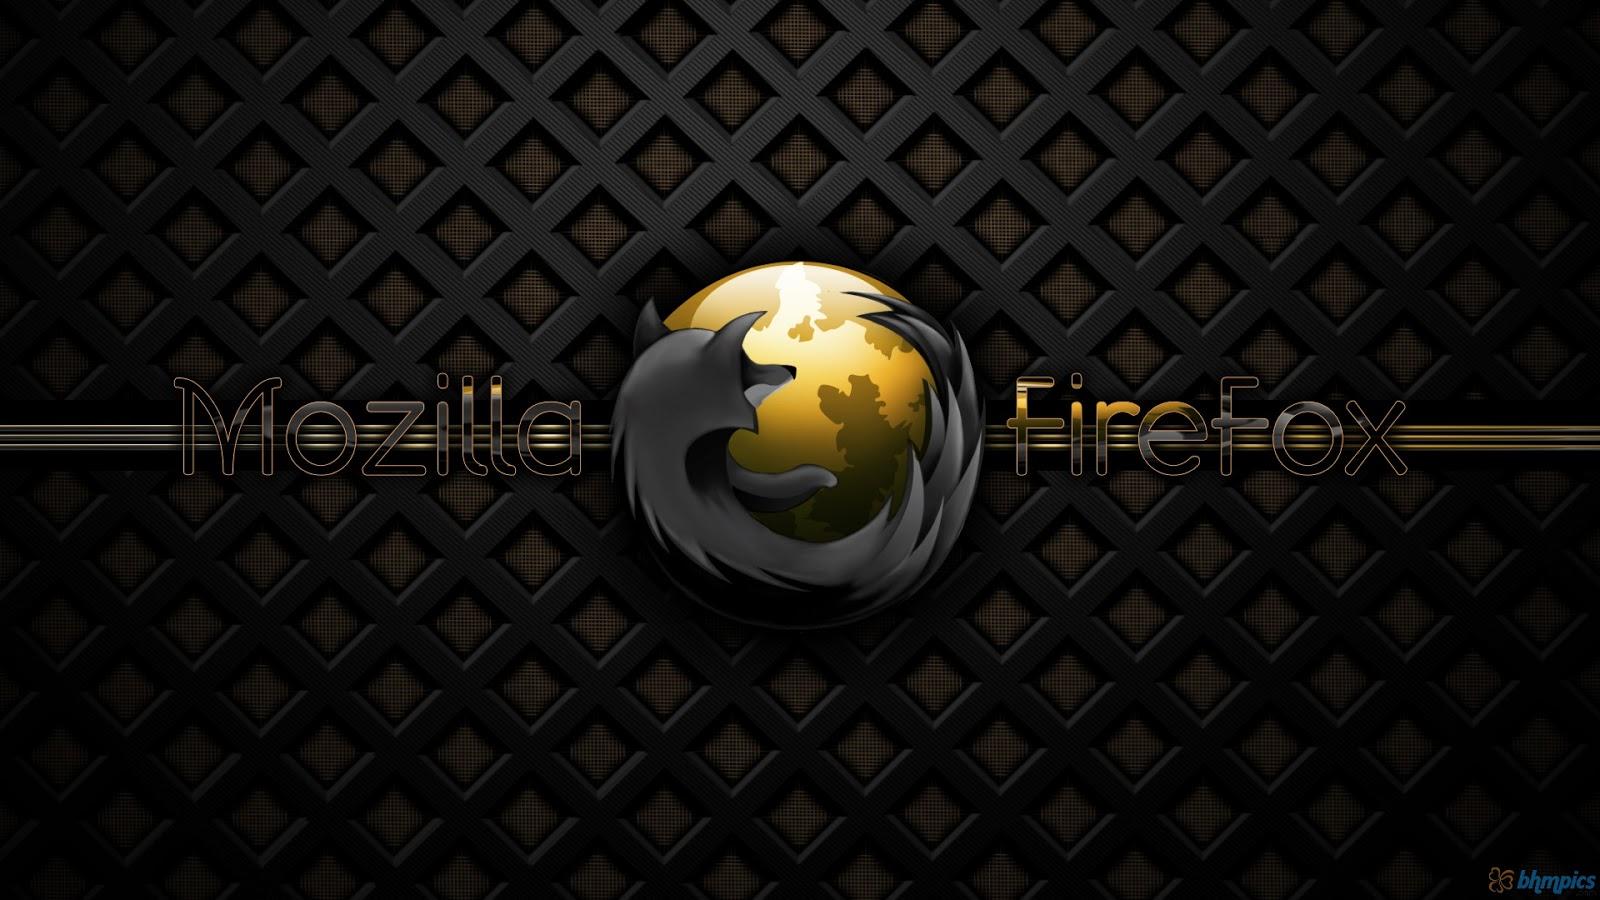 http://4.bp.blogspot.com/-dggcVJ81_NQ/UH5MZ06gifI/AAAAAAAAGTg/TT4iDEayo7w/s1600/mozilla_firefox_browser-1920x1080.jpg